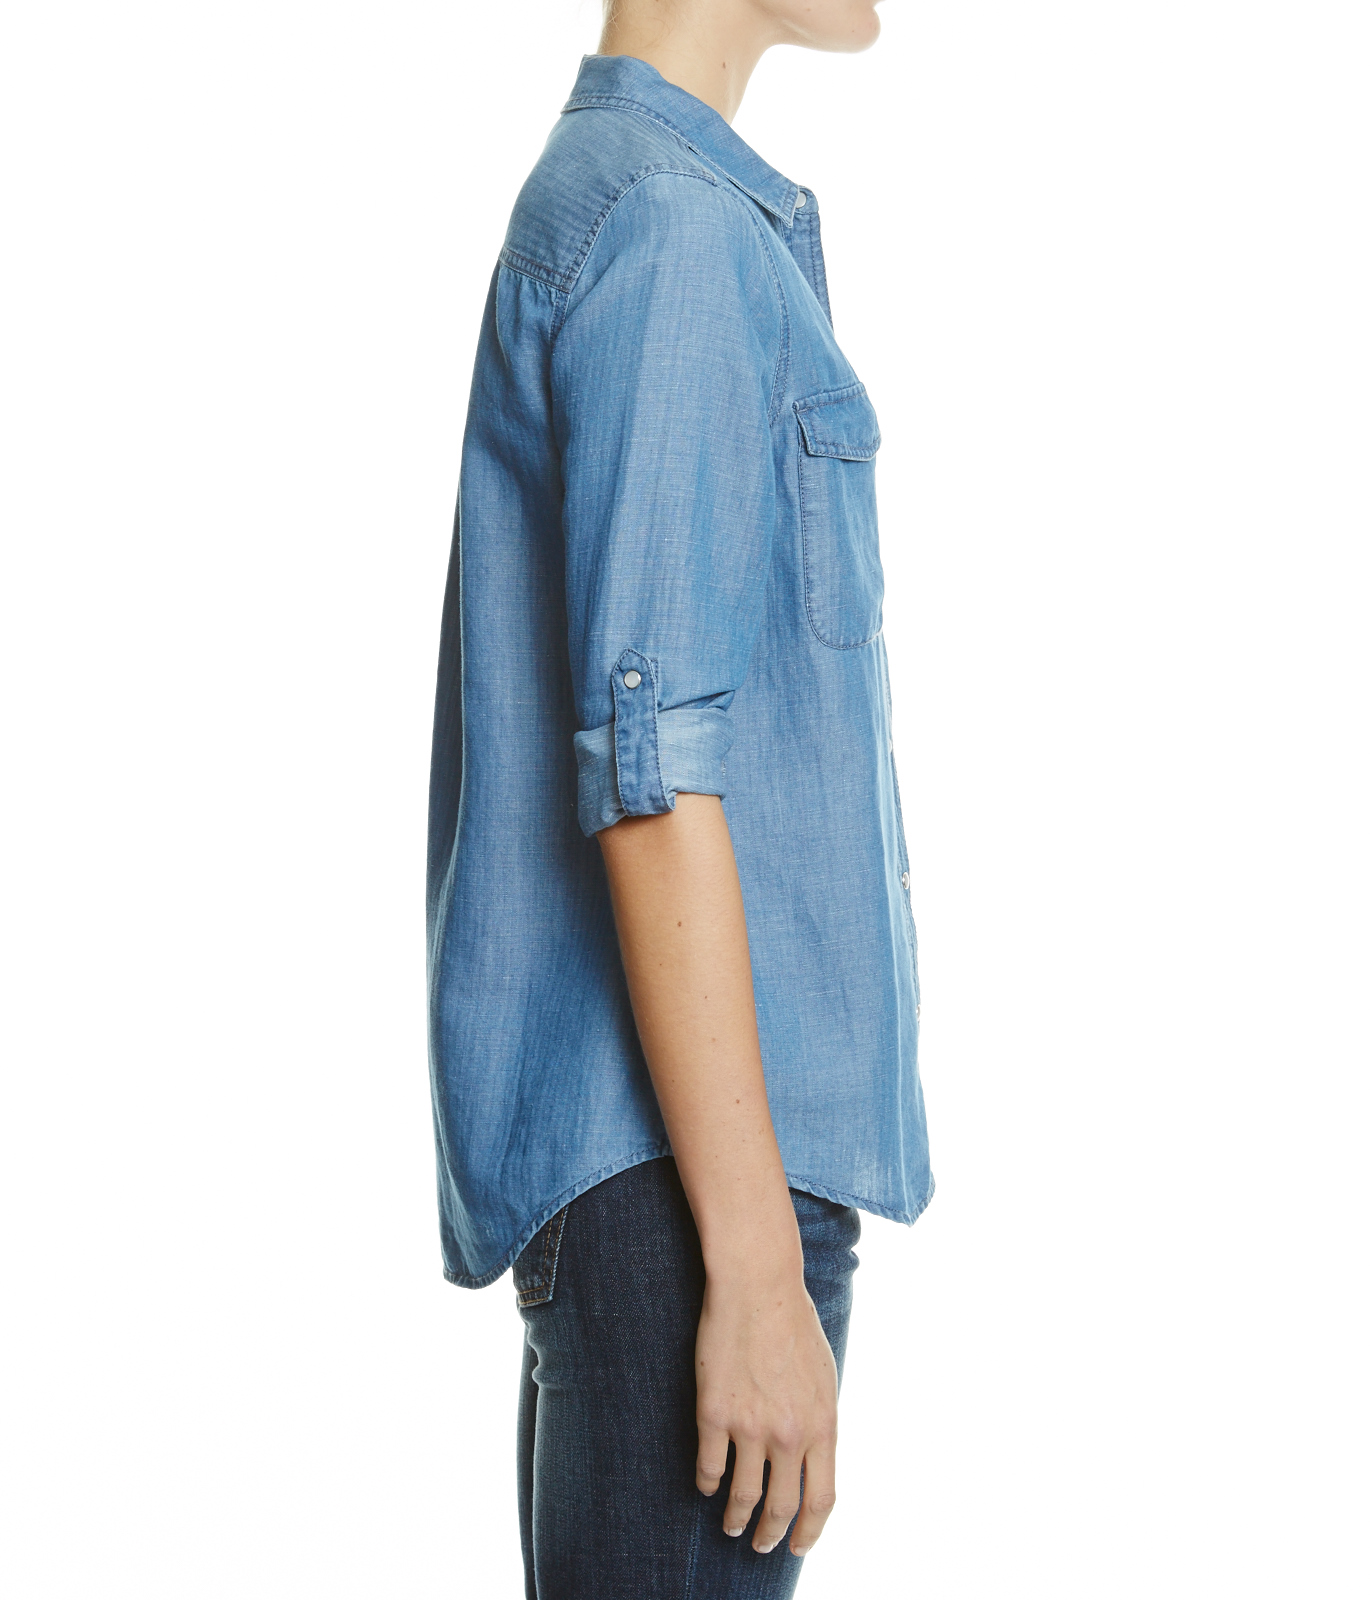 Denim Shirt - Denim On Denim - JAG Online Clothing